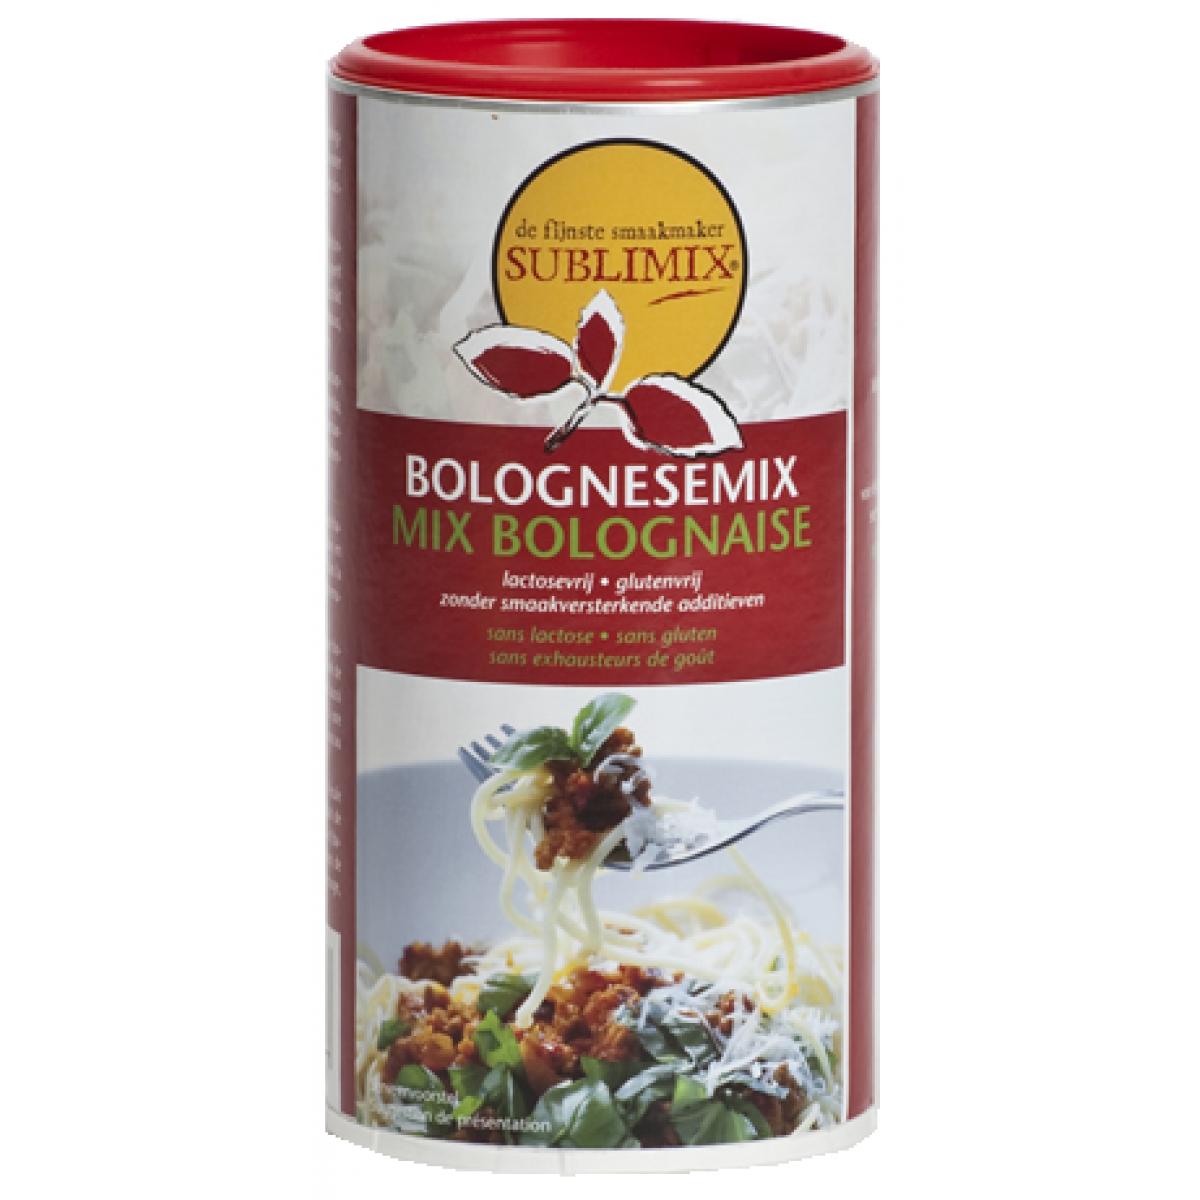 Bolognese mix